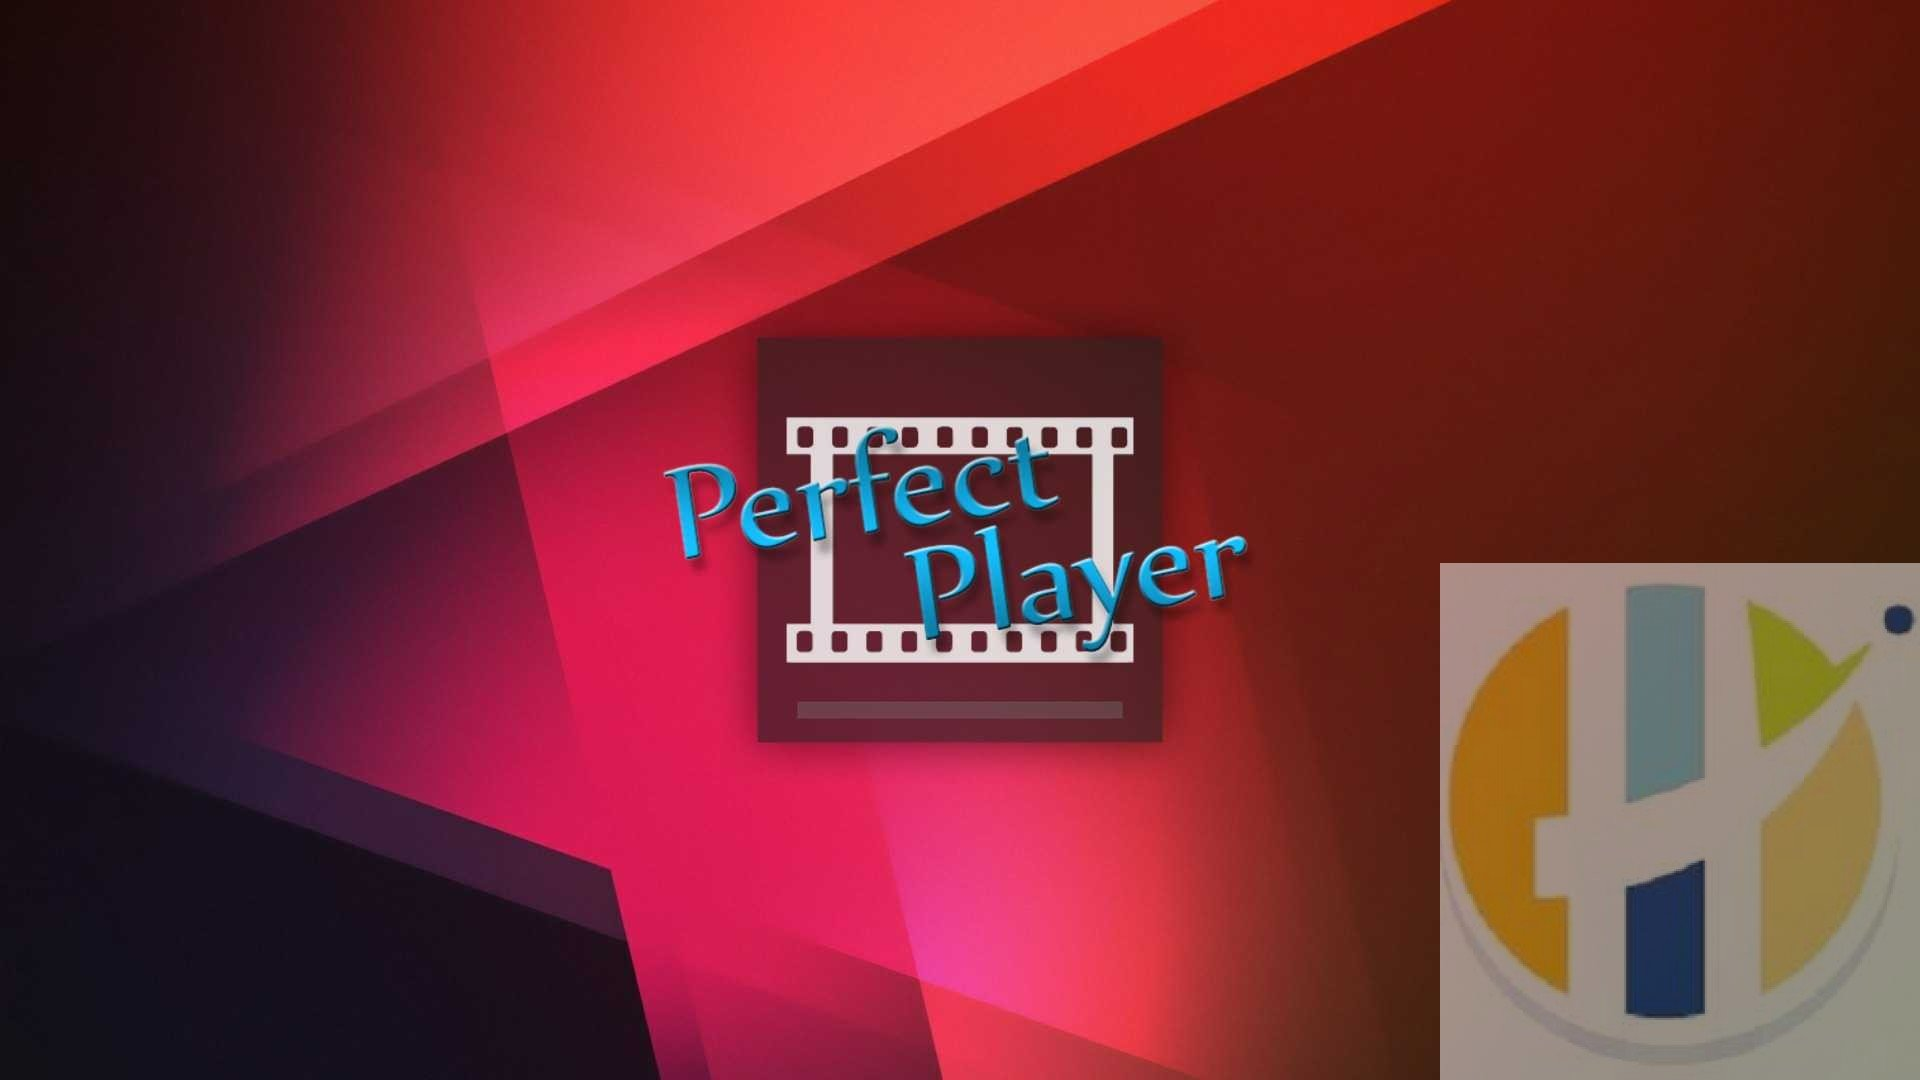 Perfect Player IPTV APP for Windows 1 1 4 - Husham com PC